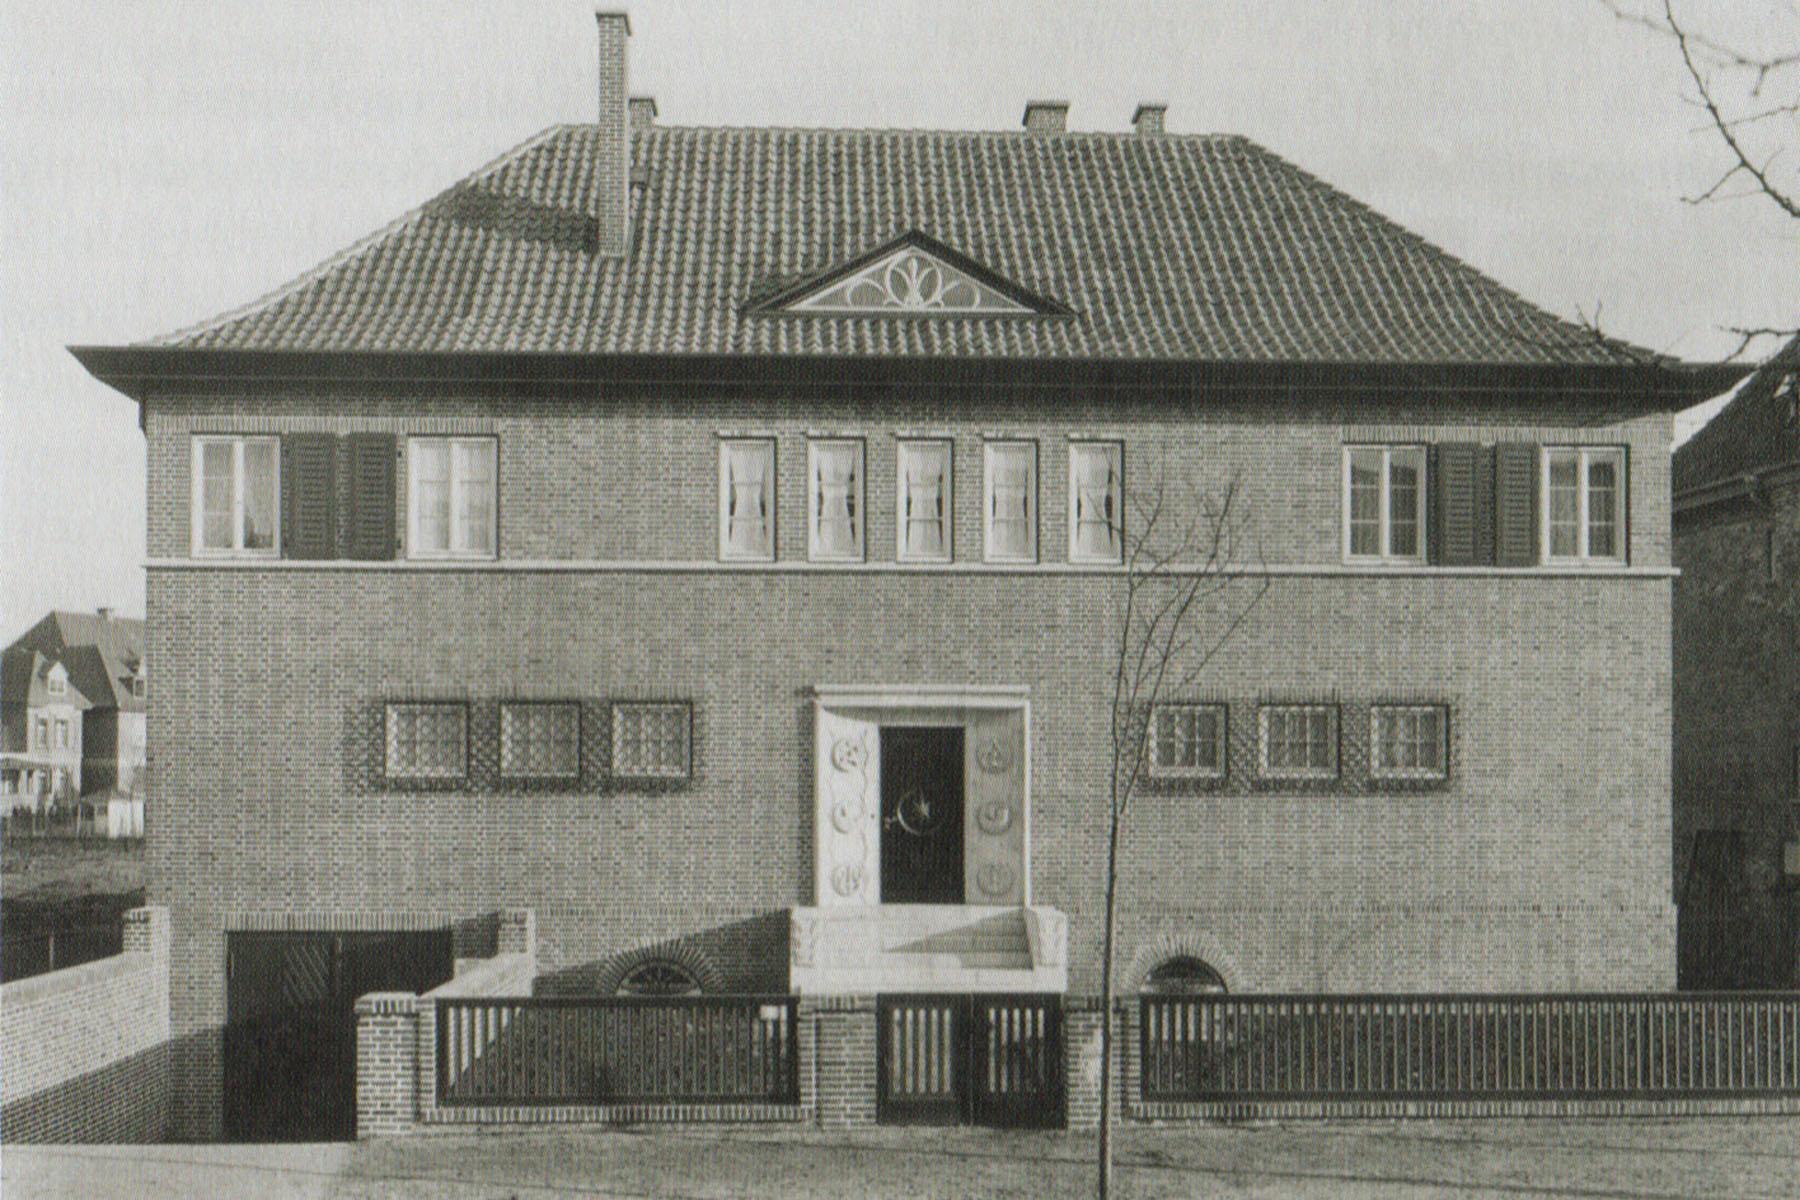 Renovierung denkmalgeschützter Stadtvilla - Damals